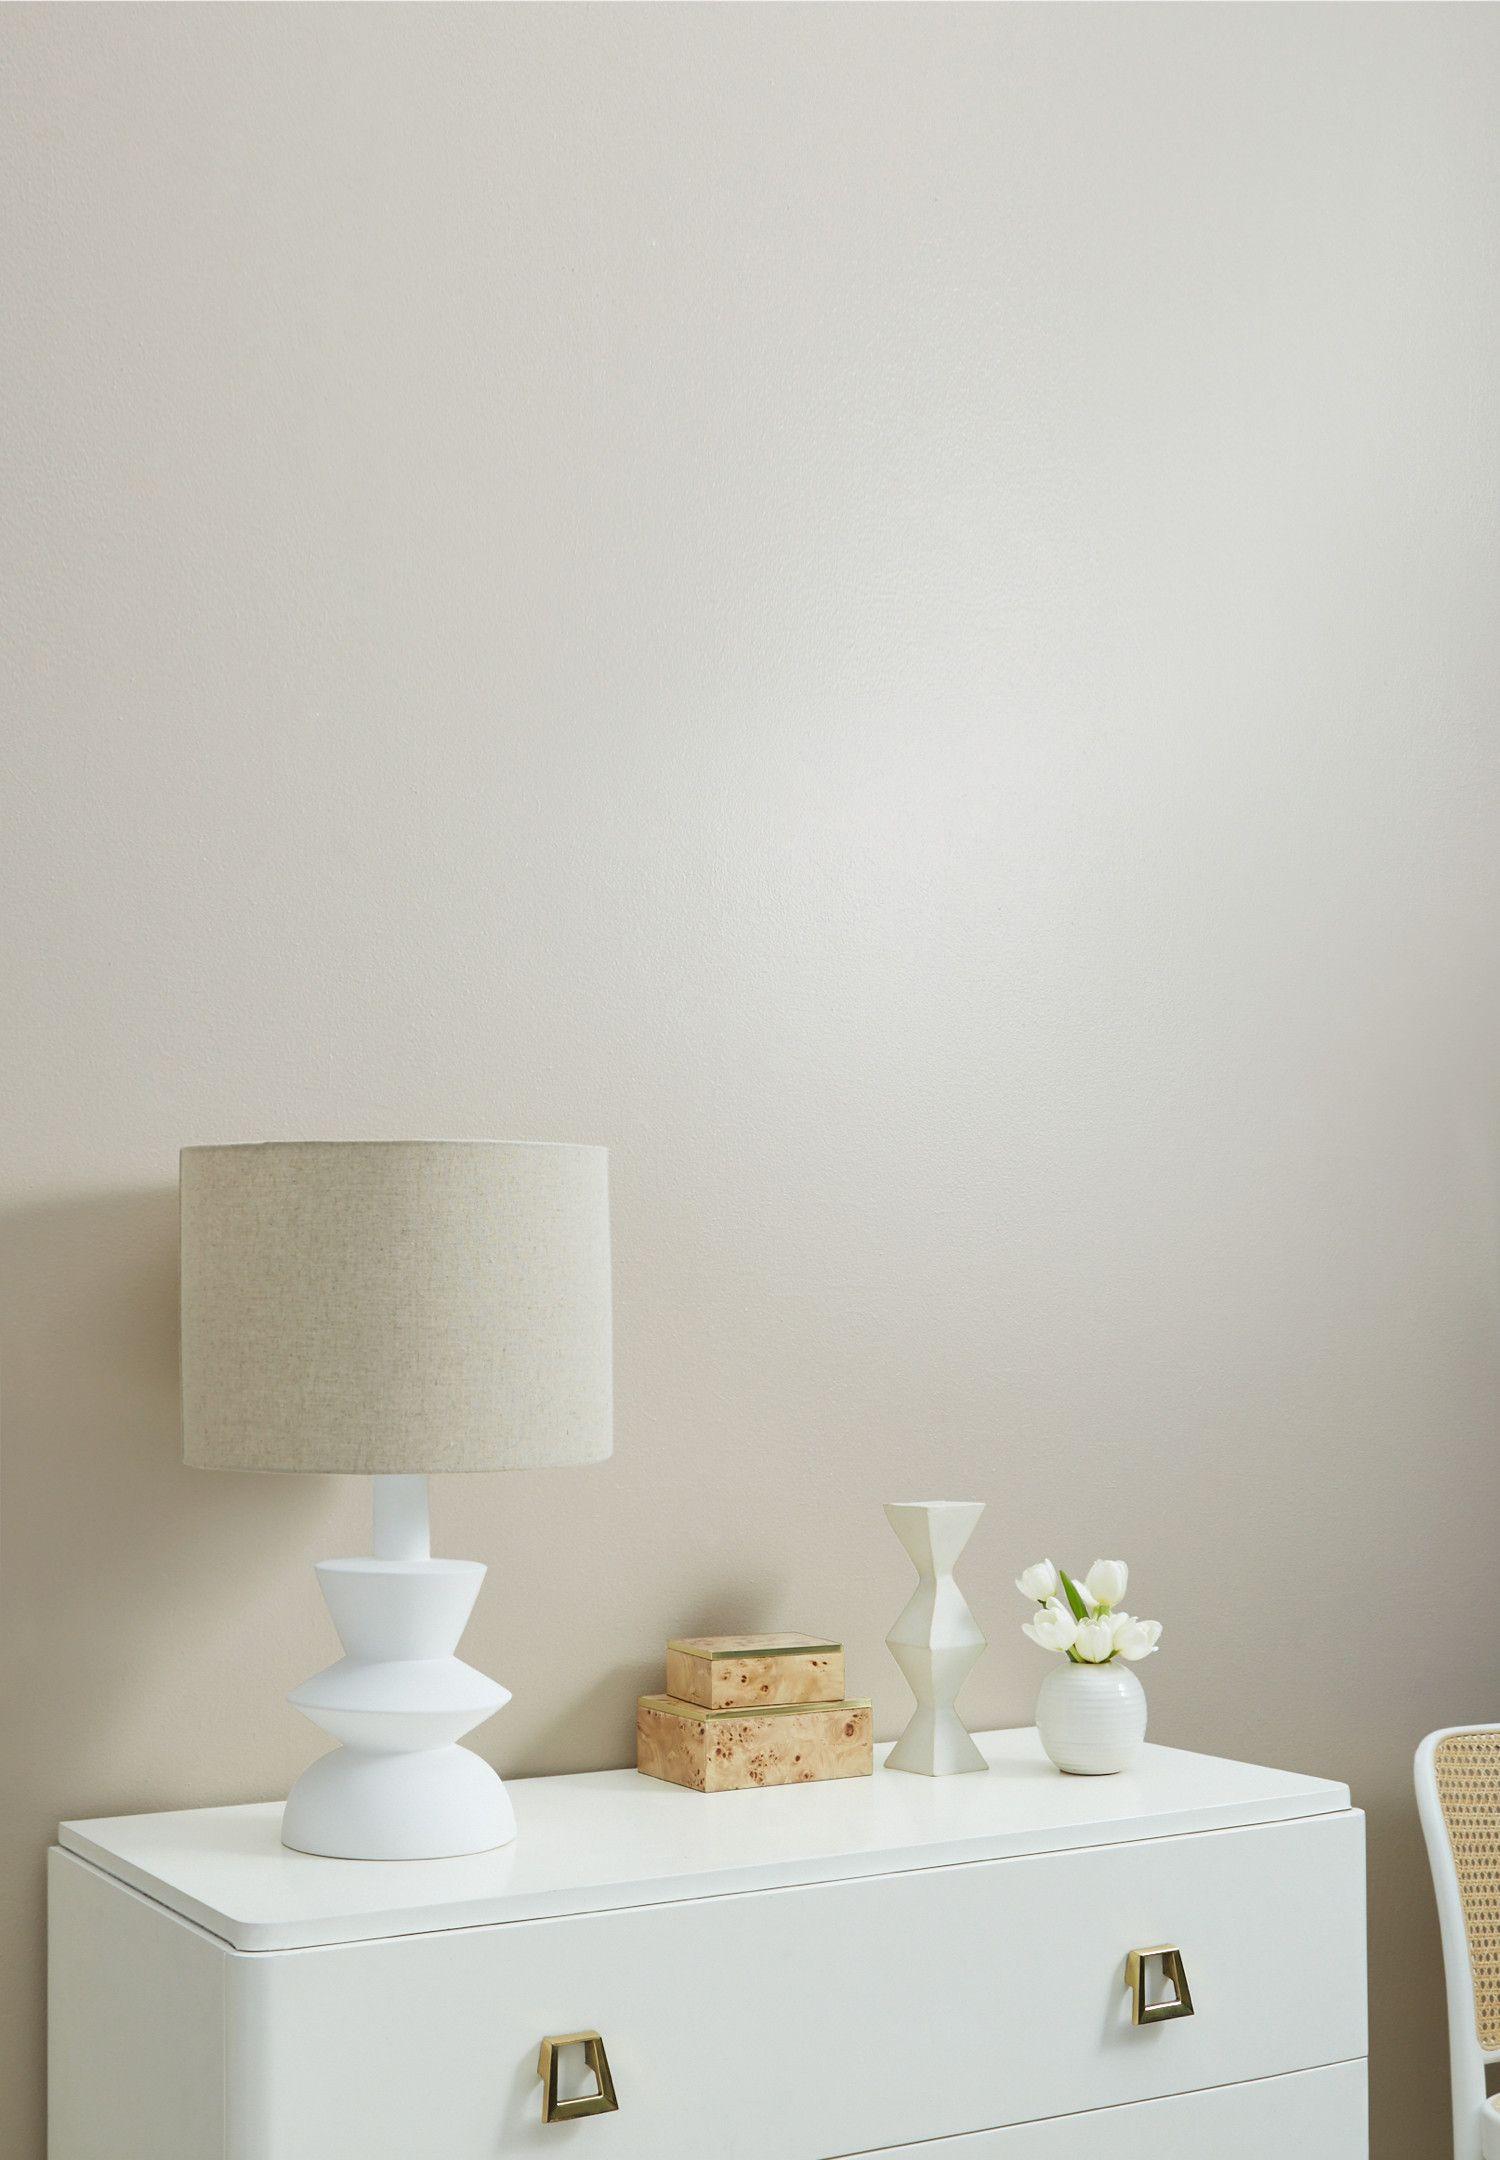 Bedroom Painted In Clare Paint Beiging A Fresh Modern Beige With Red Undertones Painting Beigebedroom Diy Diyhomedecor